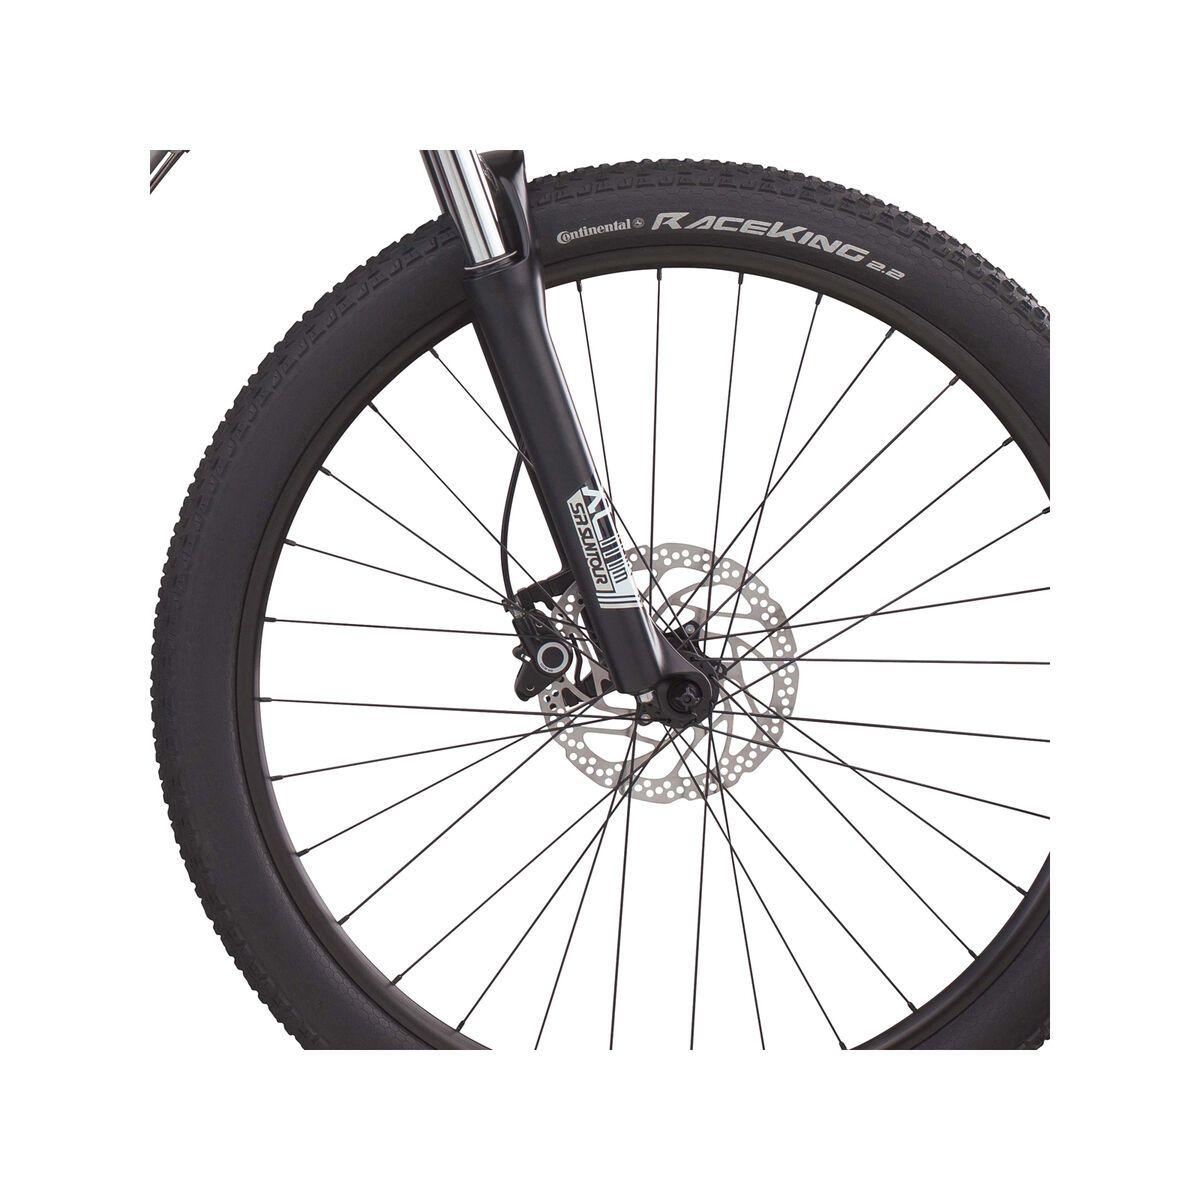 BMC Sportelite SE Alivio, grey | Bild 2